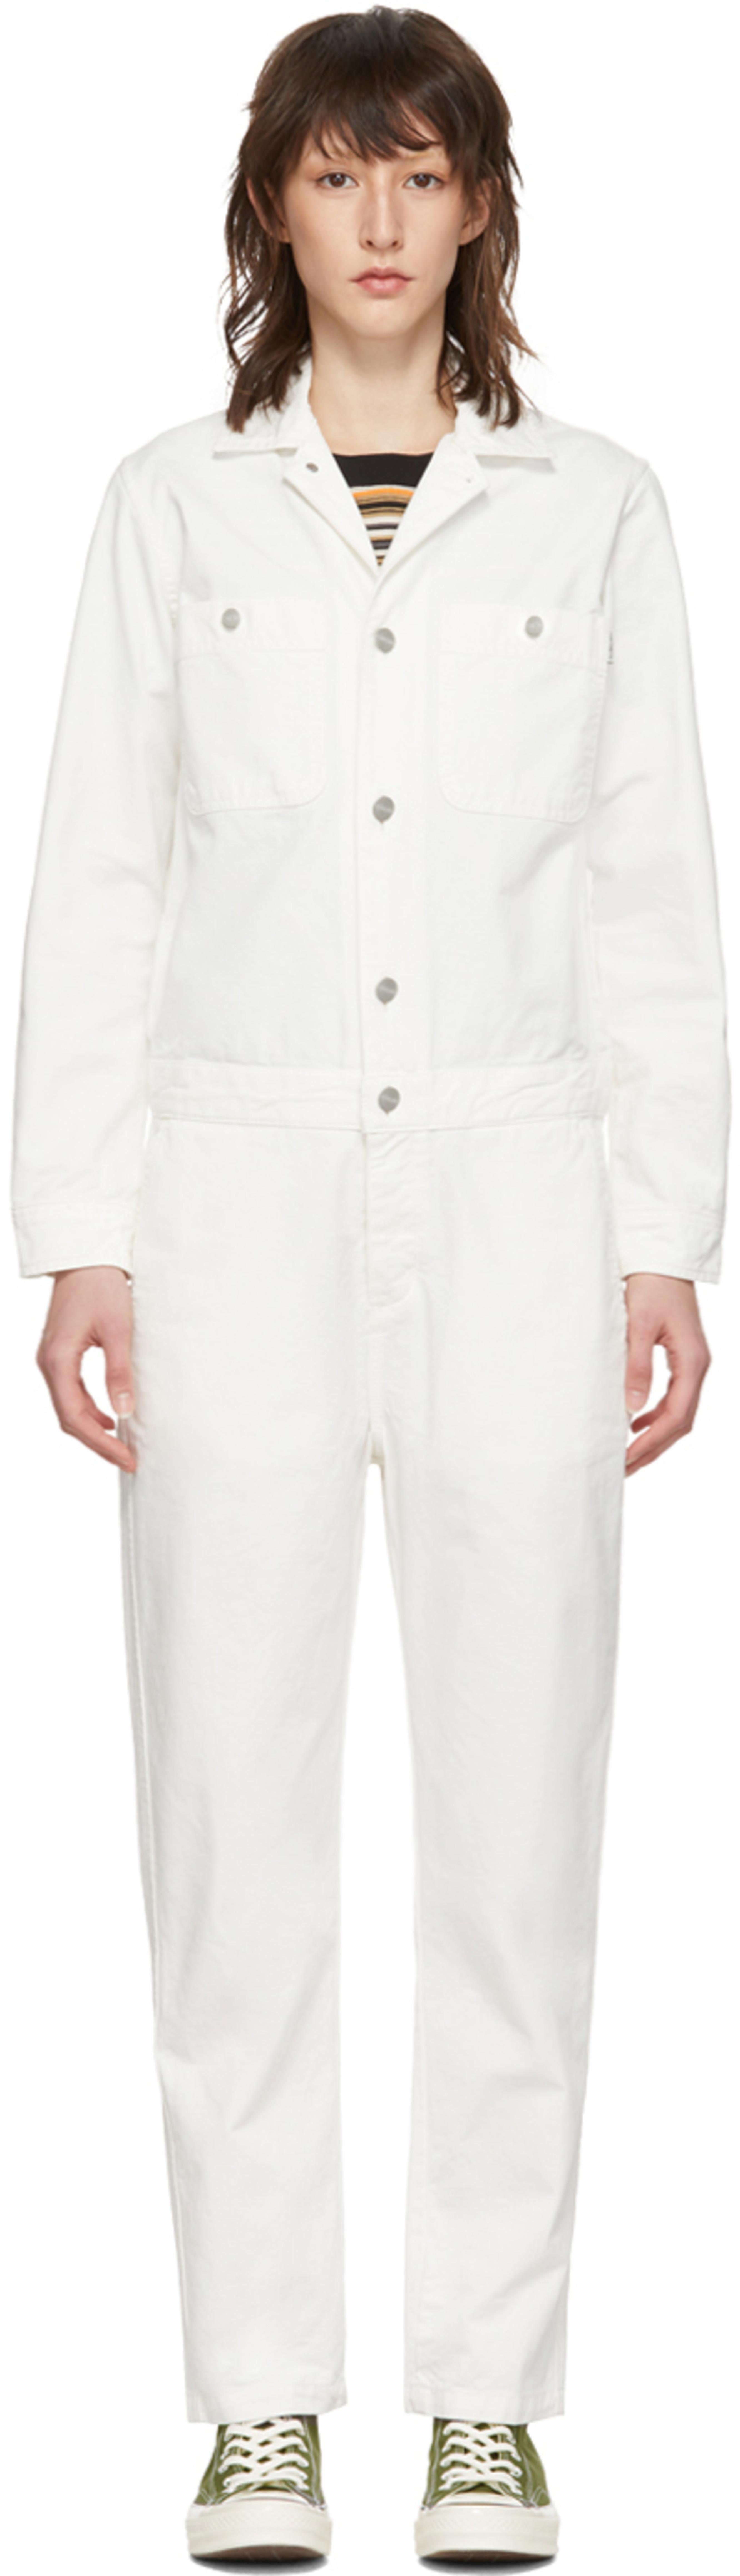 b94b57303ef Carhartt Work In Progress clothing for Women | SSENSE